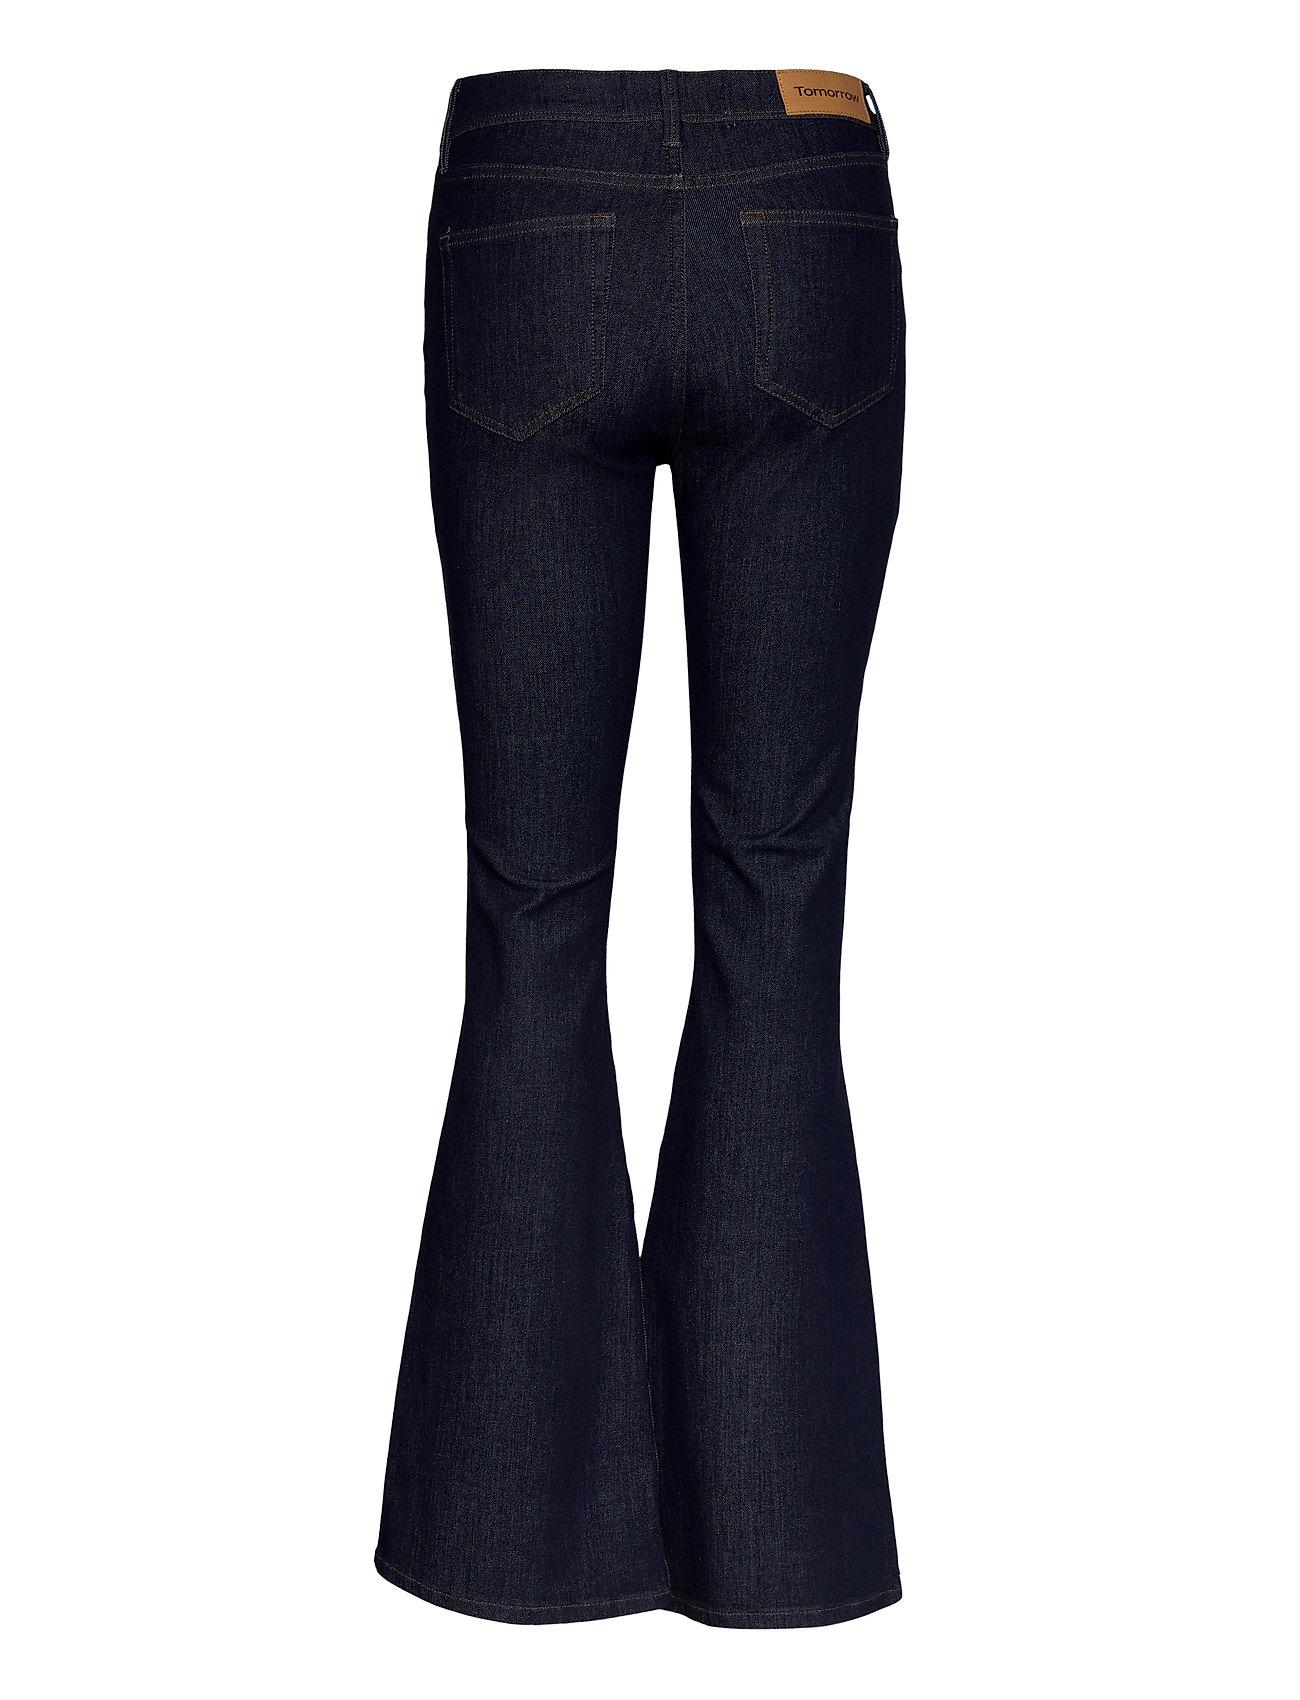 Tomorrow - Albert flare jeans Rinse - schlaghosen - denim blue - 1